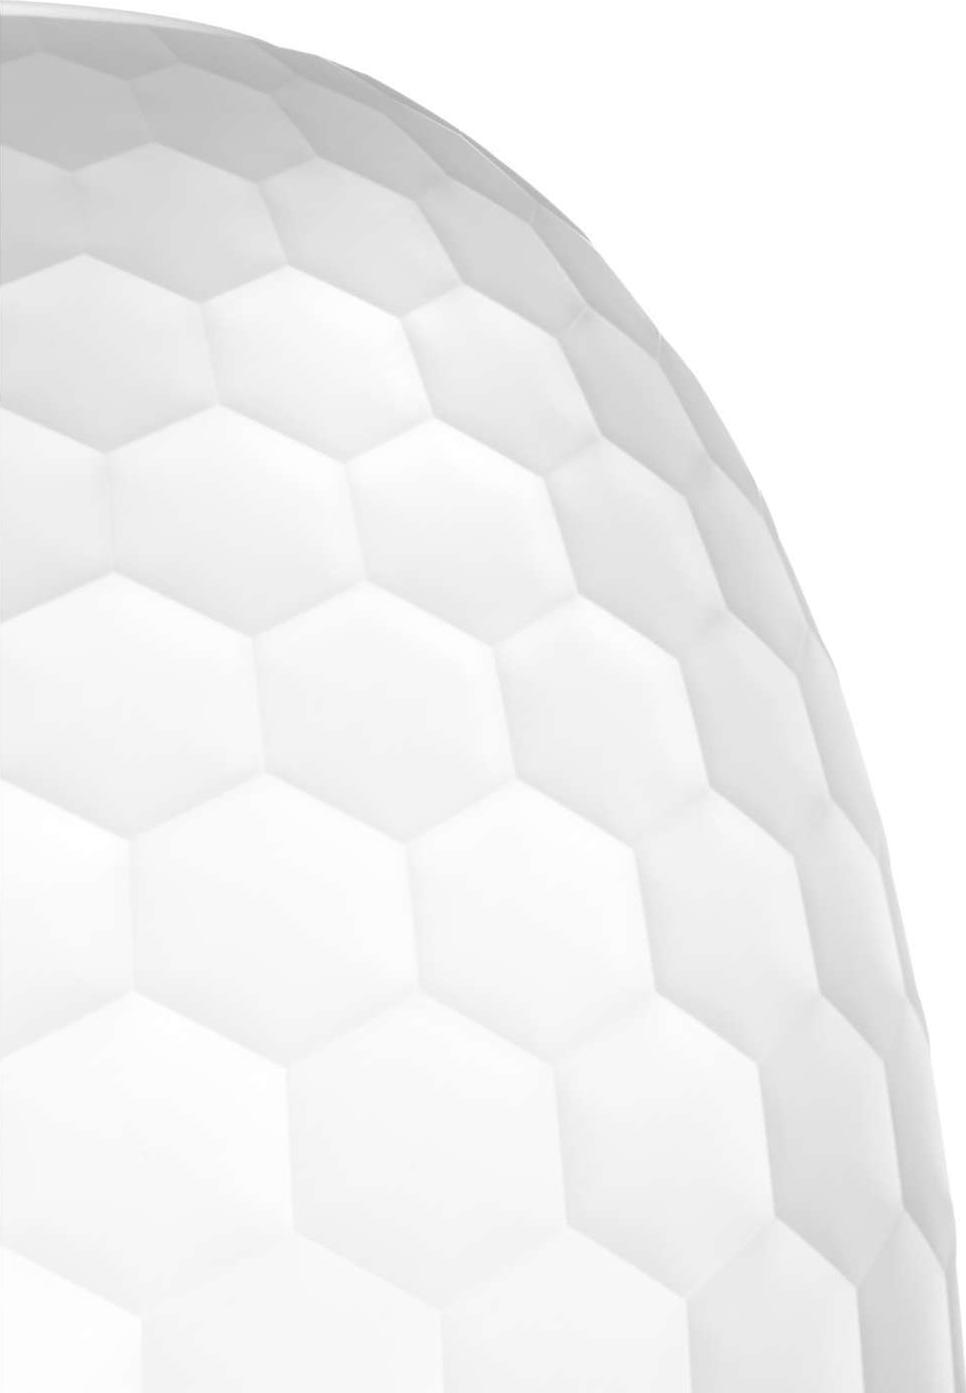 Philips LED conbrio svietidlo závěsné biela 4,5w 37561/31/16